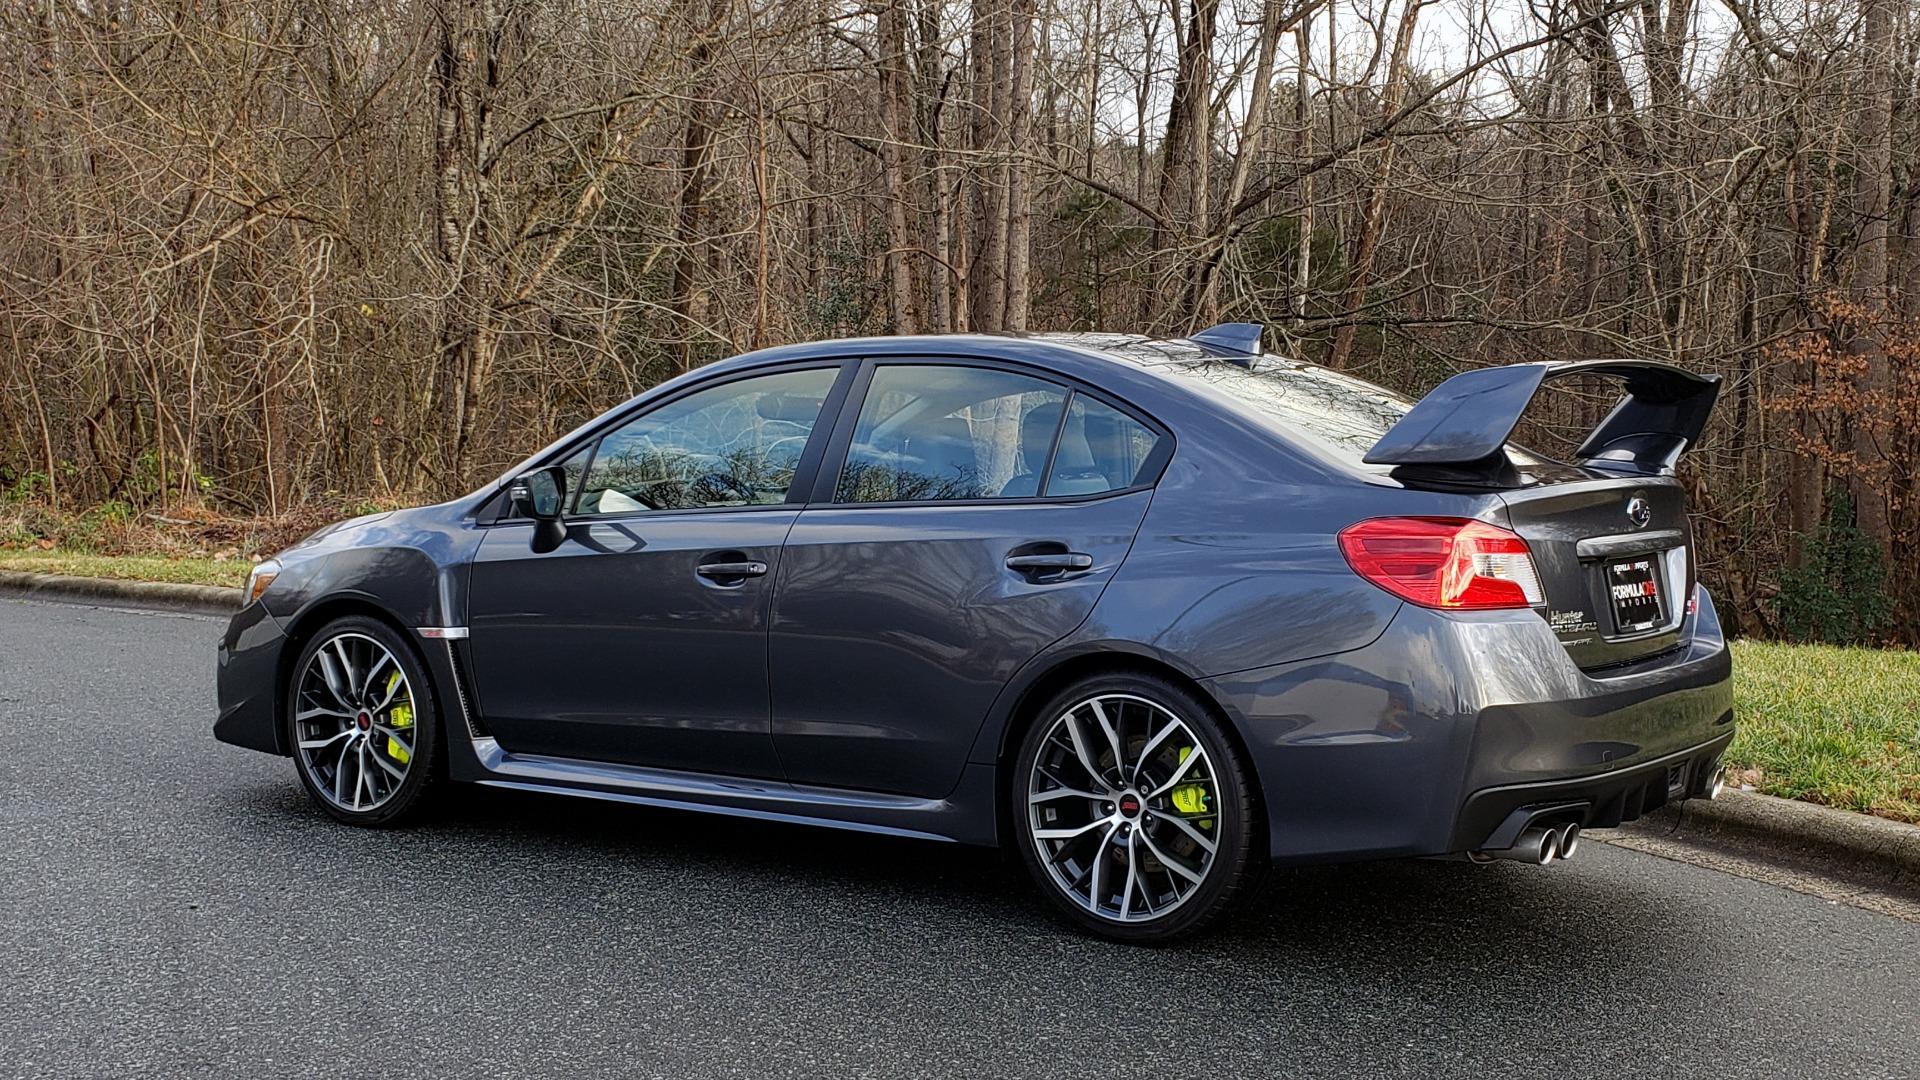 Used 2020 Subaru WRX STI 2.5L TURBO / 6-SPEED MANUAL / RECARO SEATS / REARVIEW for sale Sold at Formula Imports in Charlotte NC 28227 9